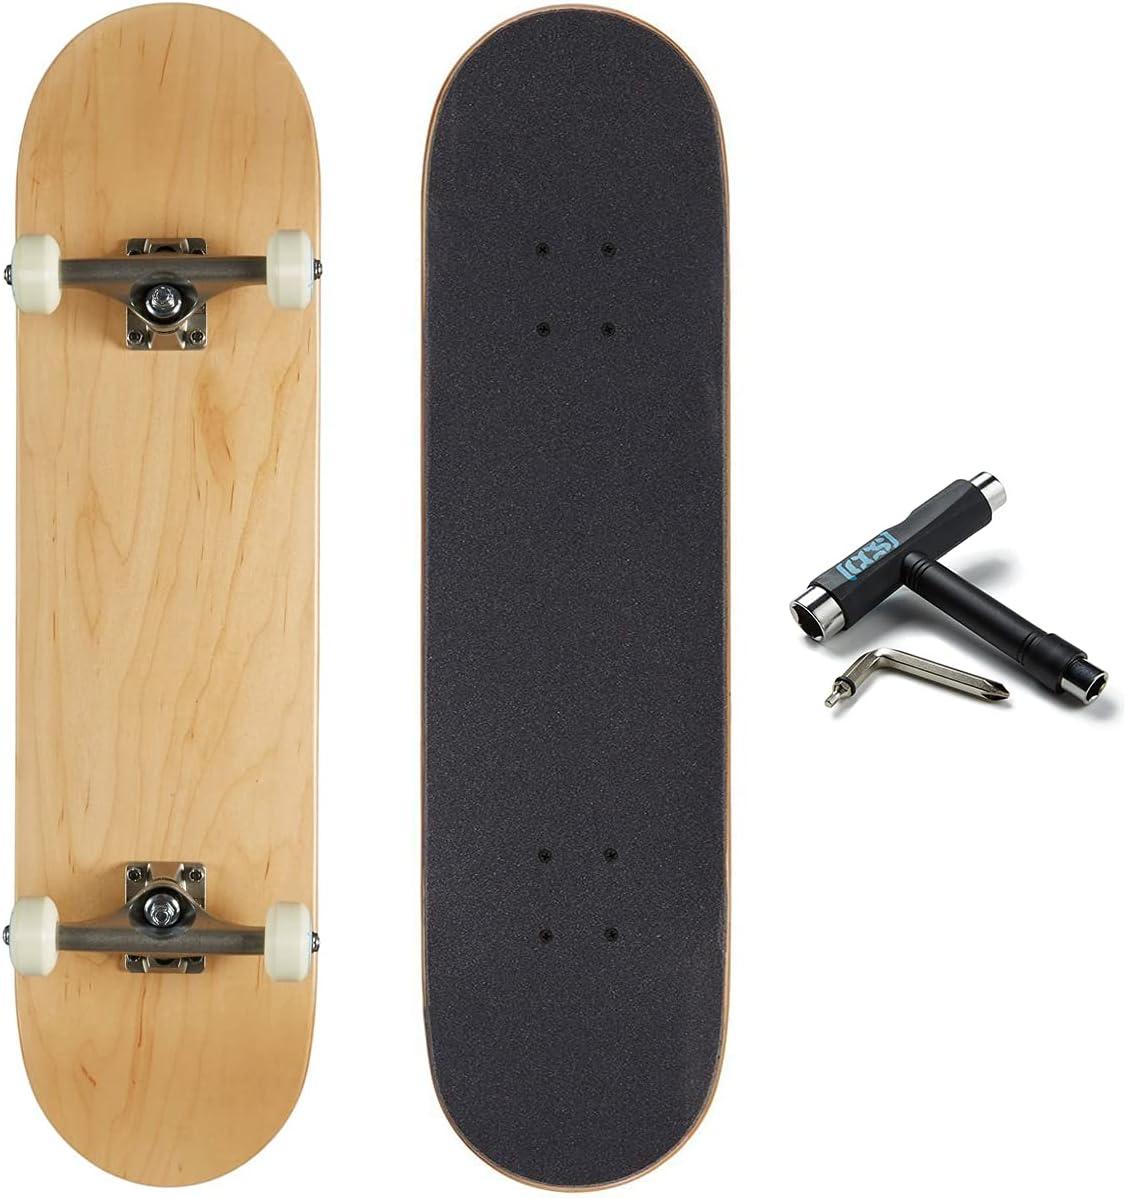 CCS skateboard review